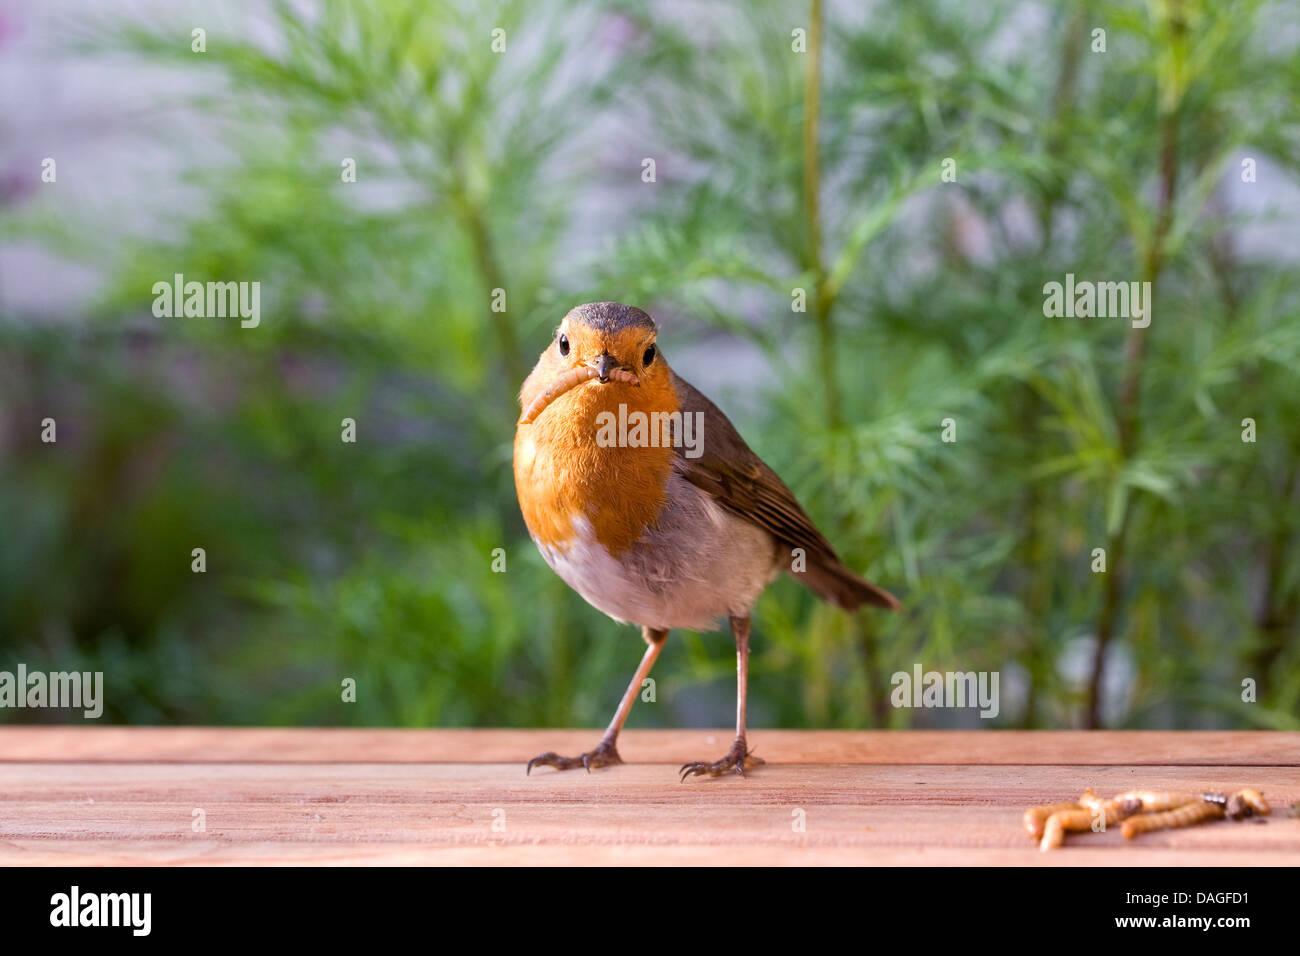 Erithacus rubecula. Robin eating mealworms in an English garden. - Stock Image